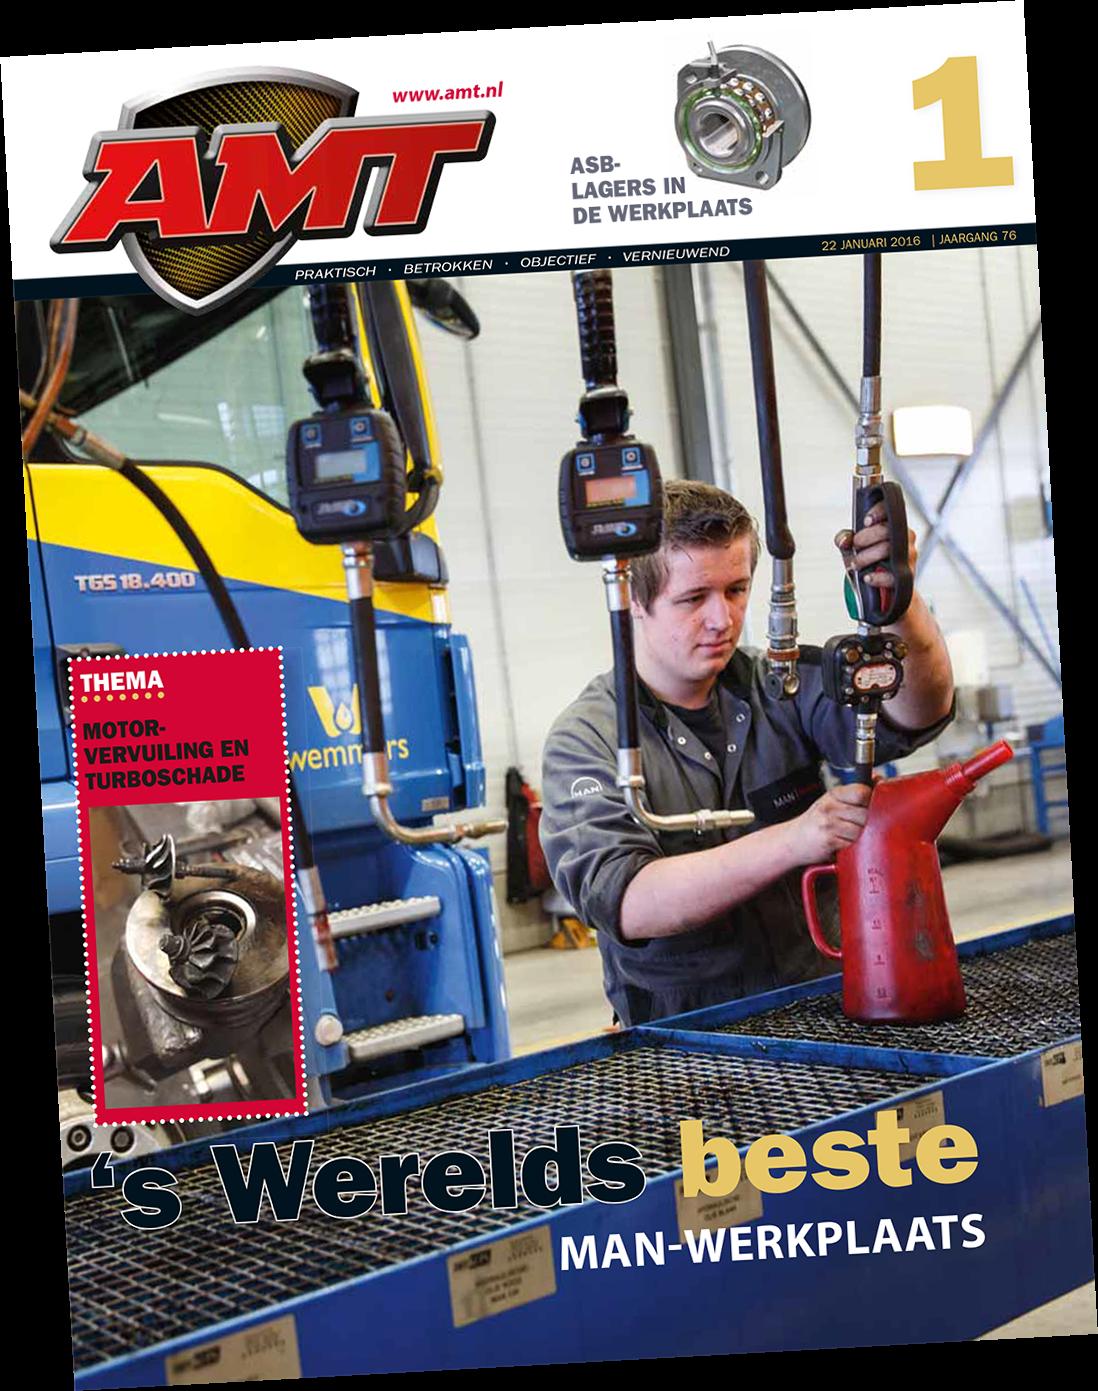 AMT editie 1-2016